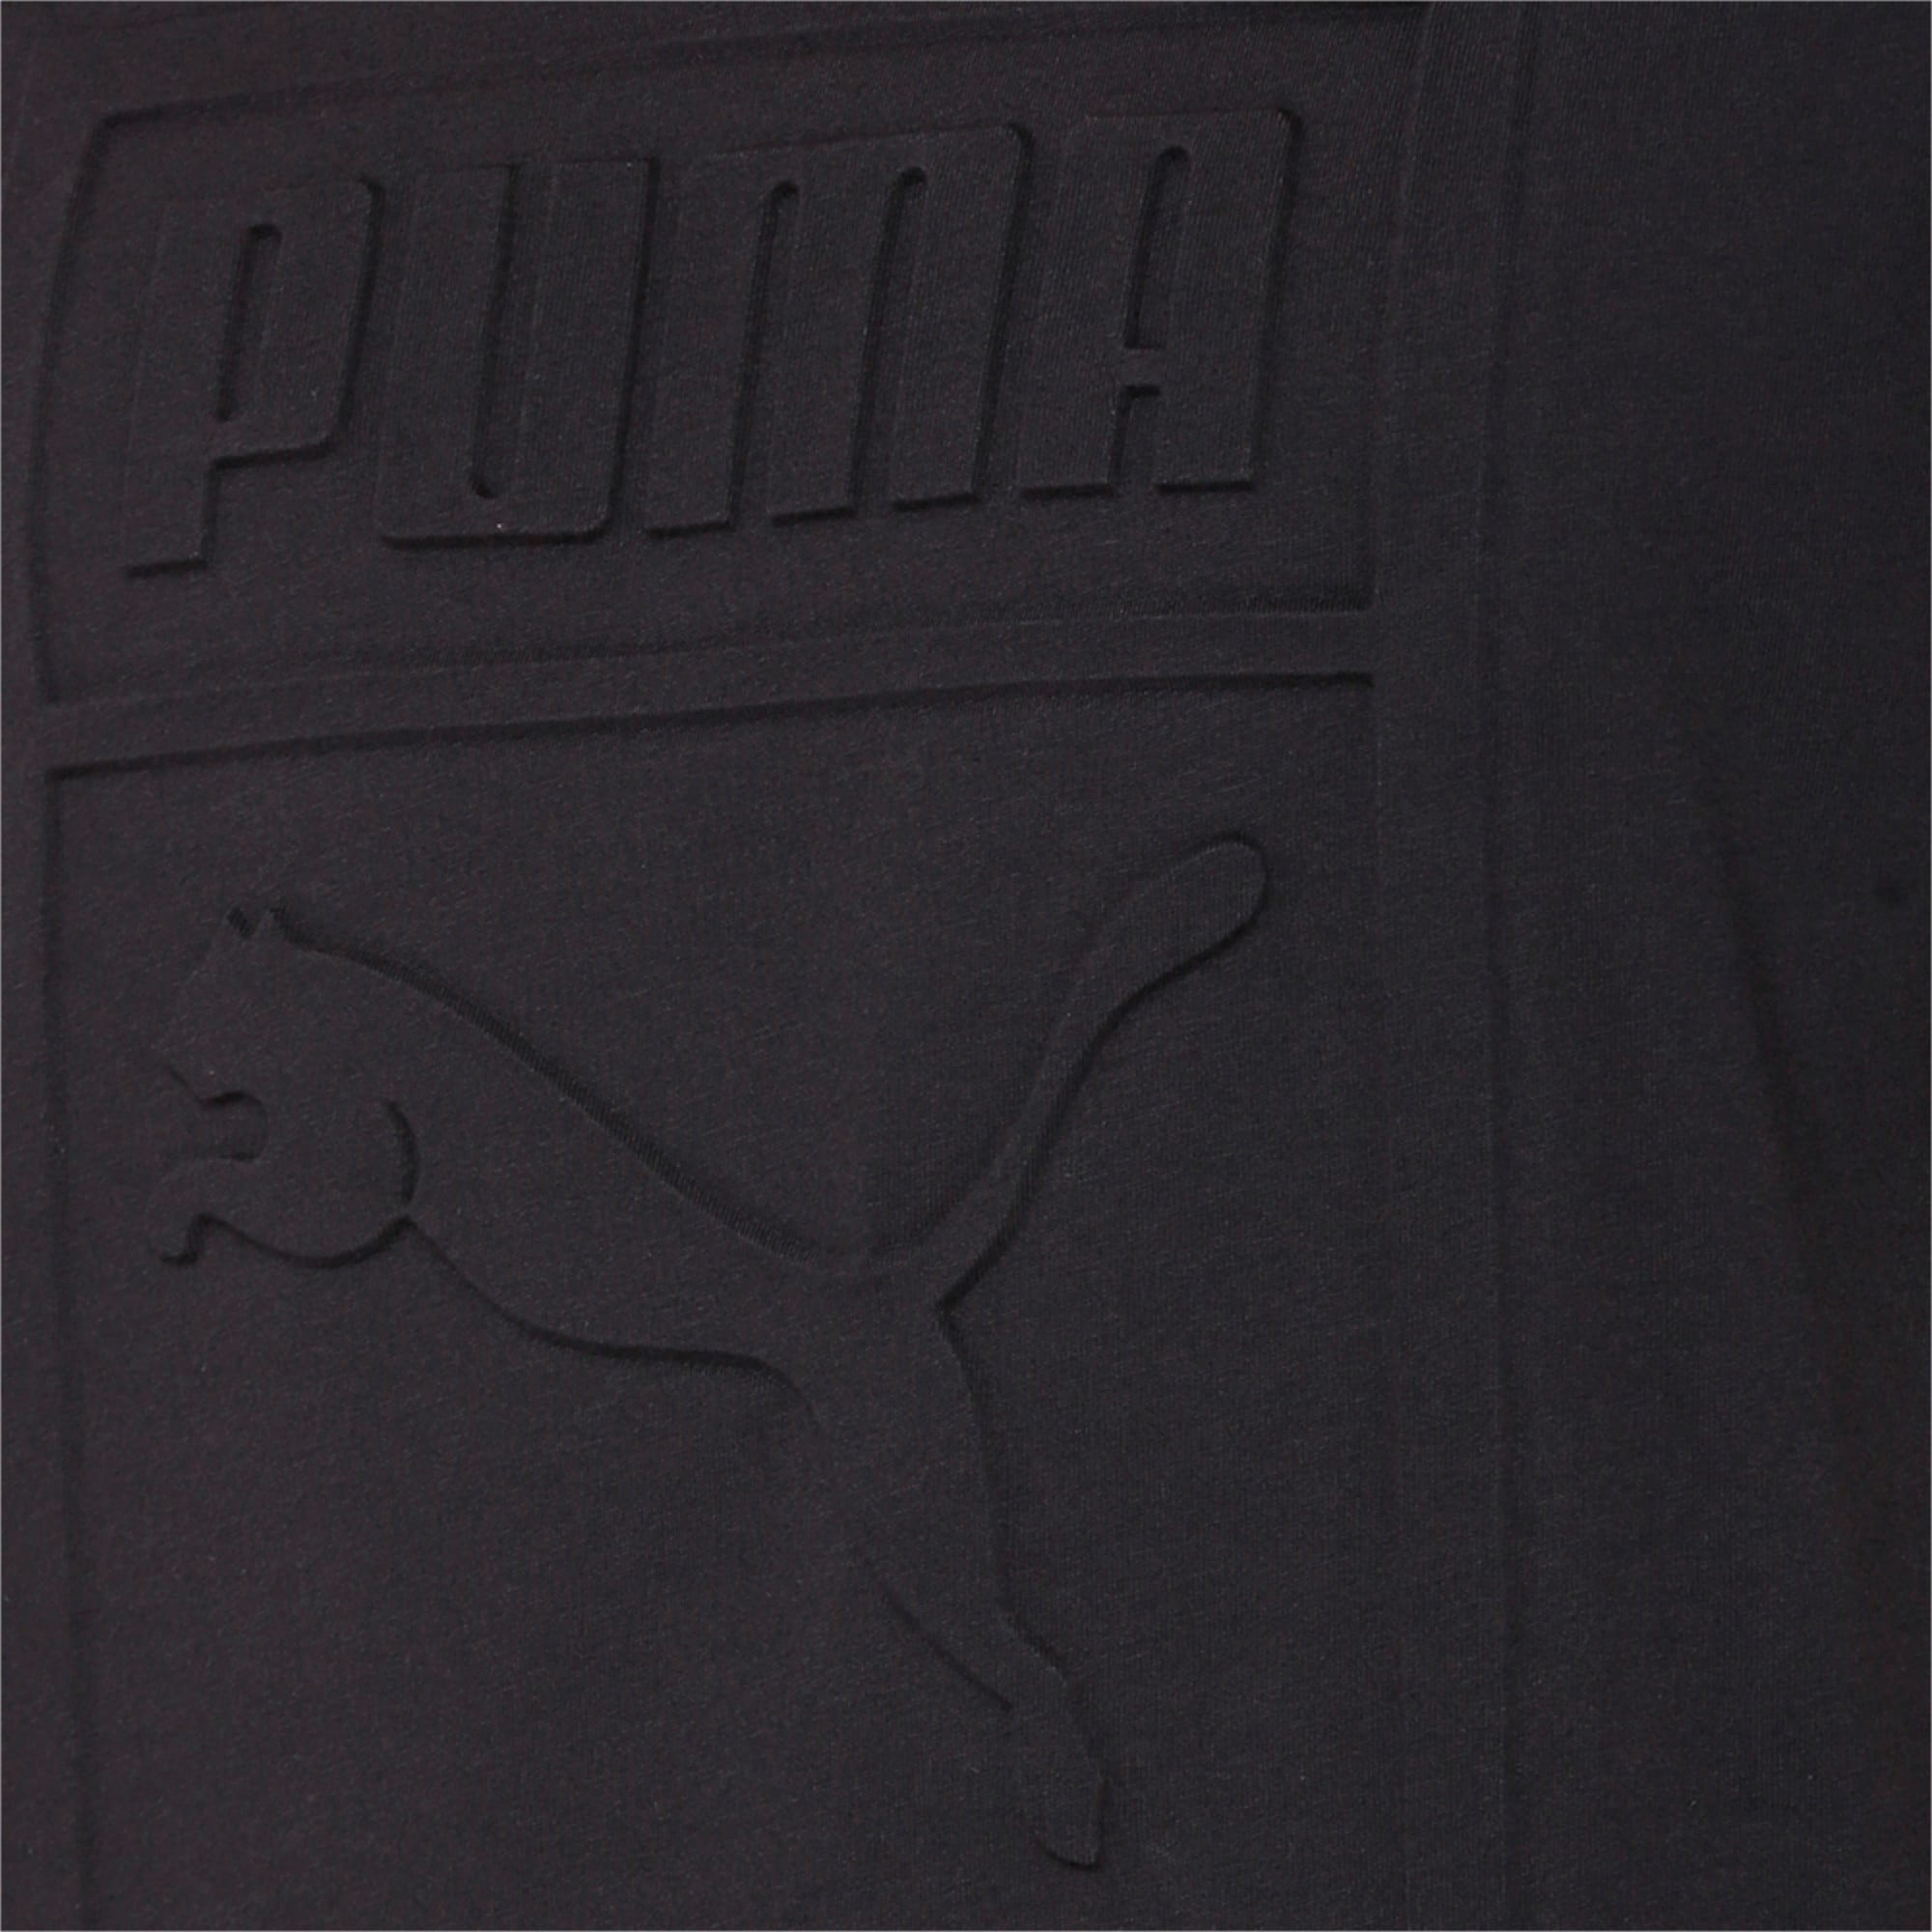 Thumbnail 6 of Classics Men's Archive Embossed Logo T-Shirt, Puma Black, medium-IND